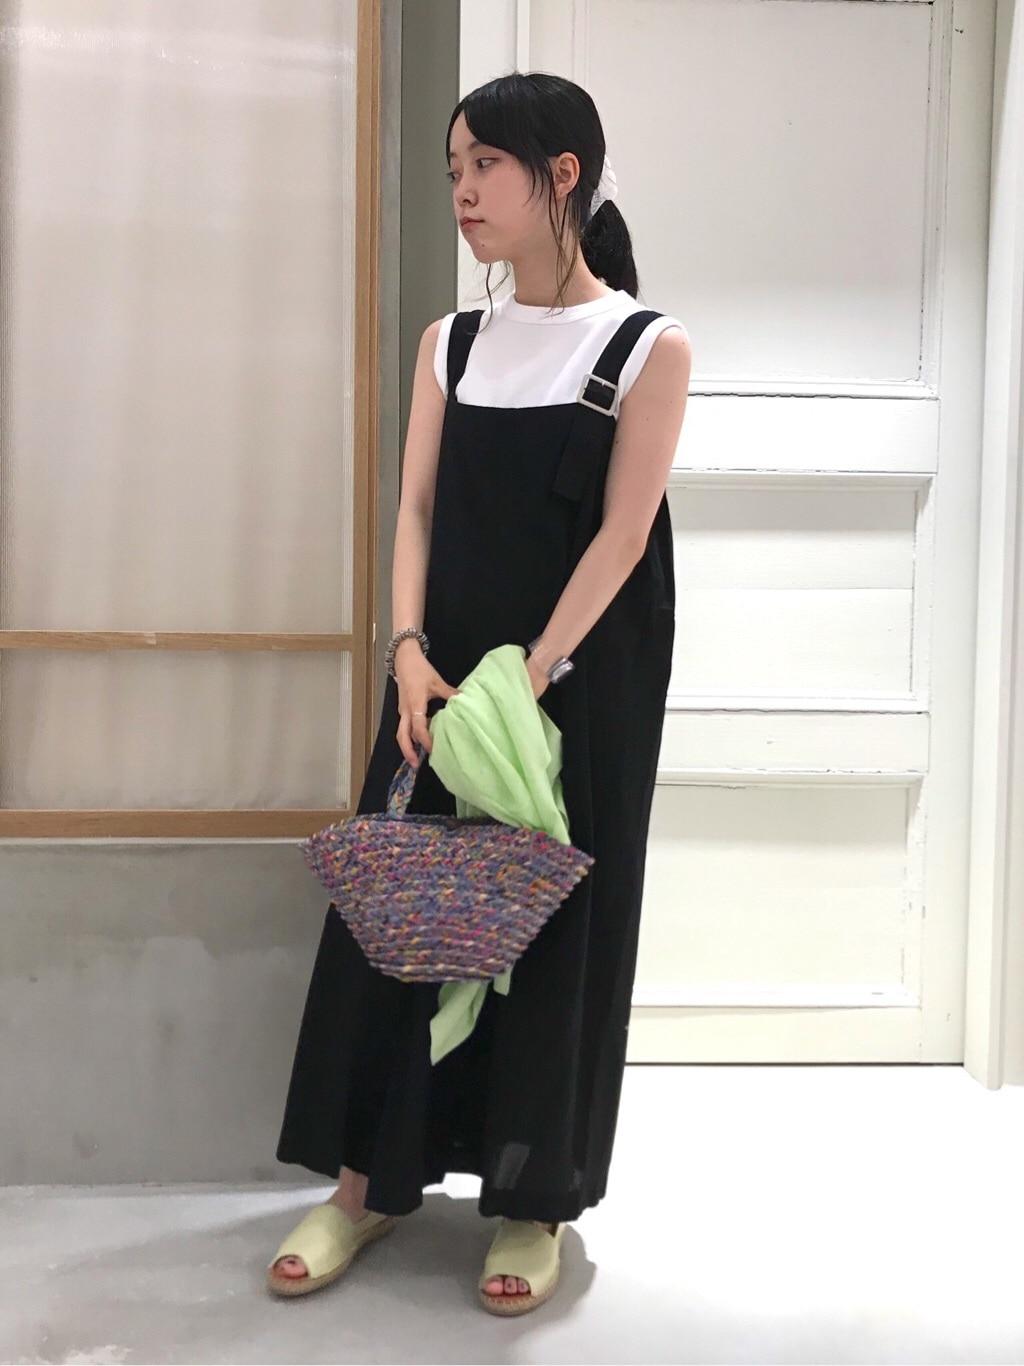 bulle de savon 渋谷スクランブルスクエア 身長:153cm 2020.06.10